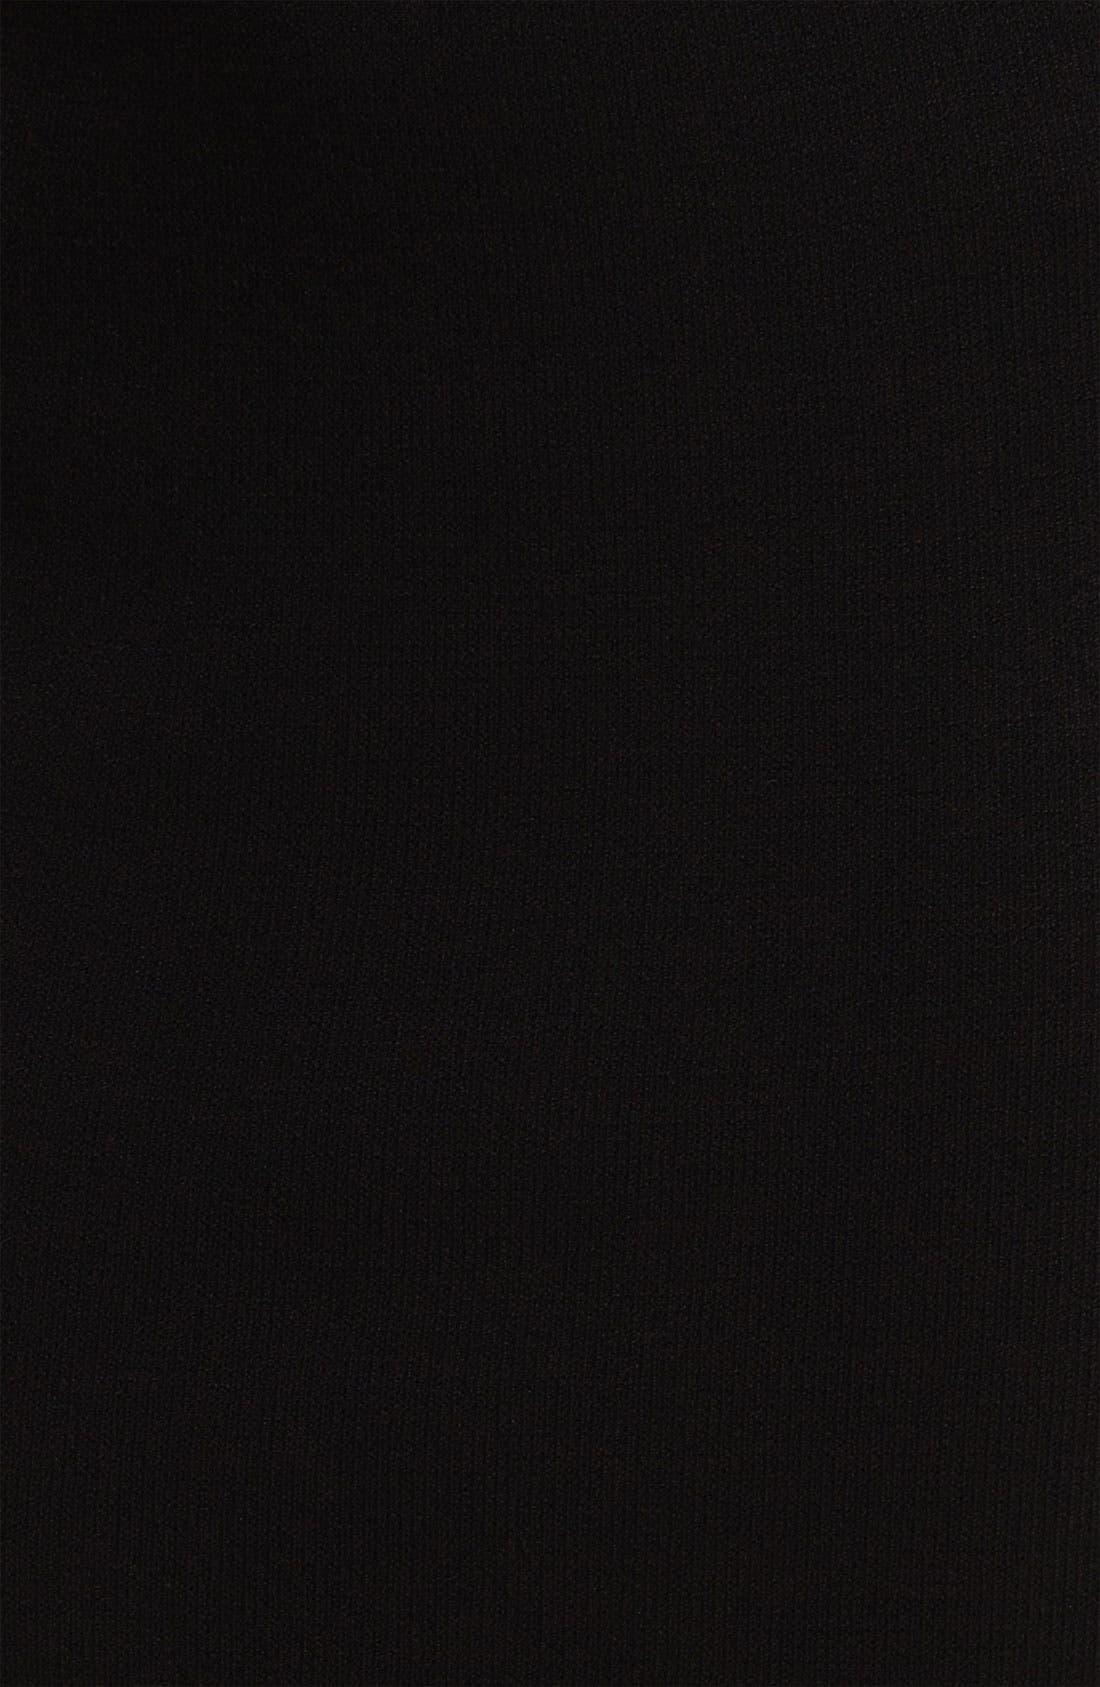 ST. JOHN COLLECTION,                             Santana Knit Skirt,                             Alternate thumbnail 6, color,                             001